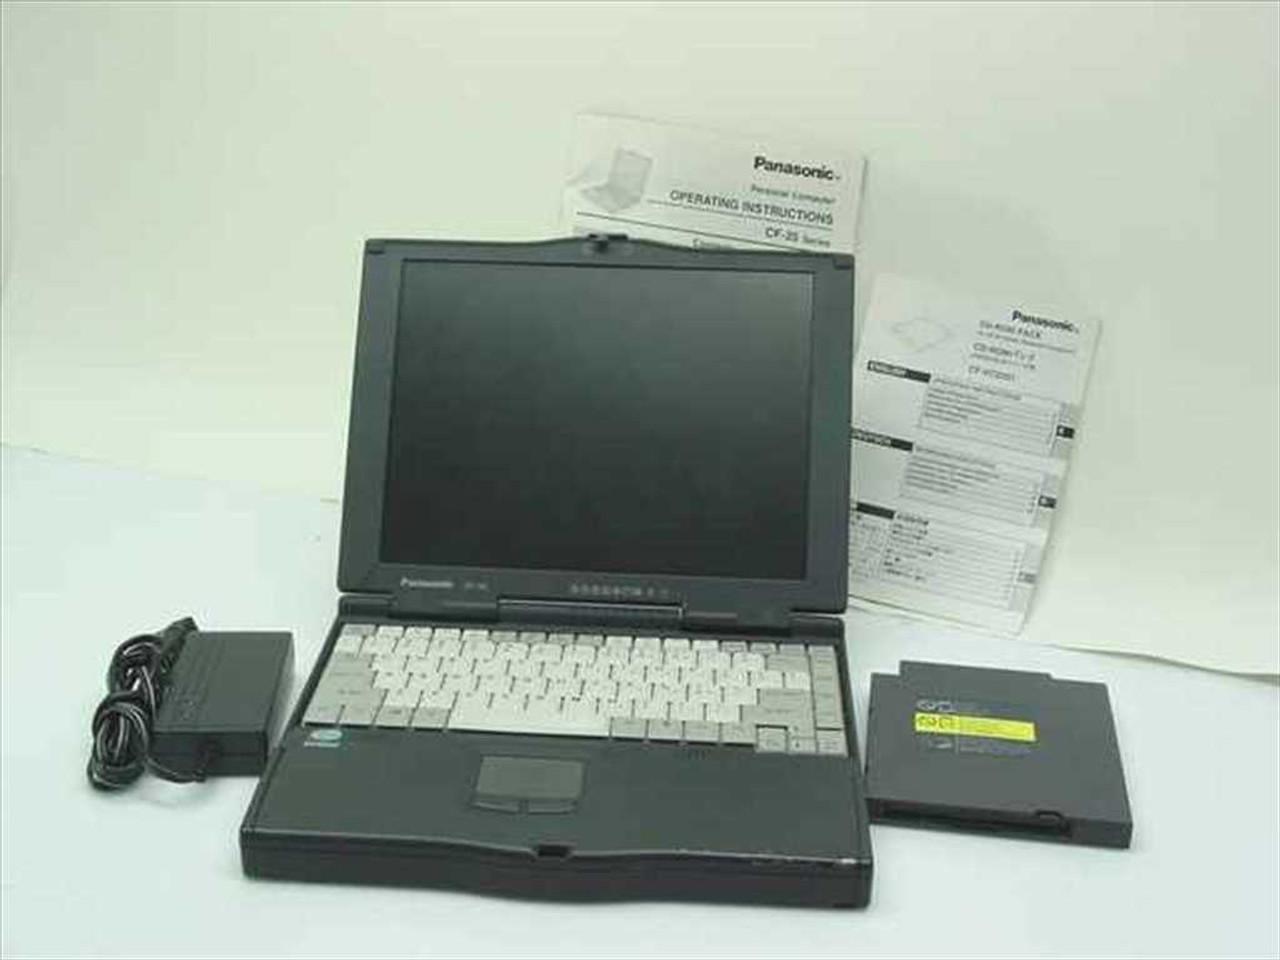 kensington laptop lock instructions